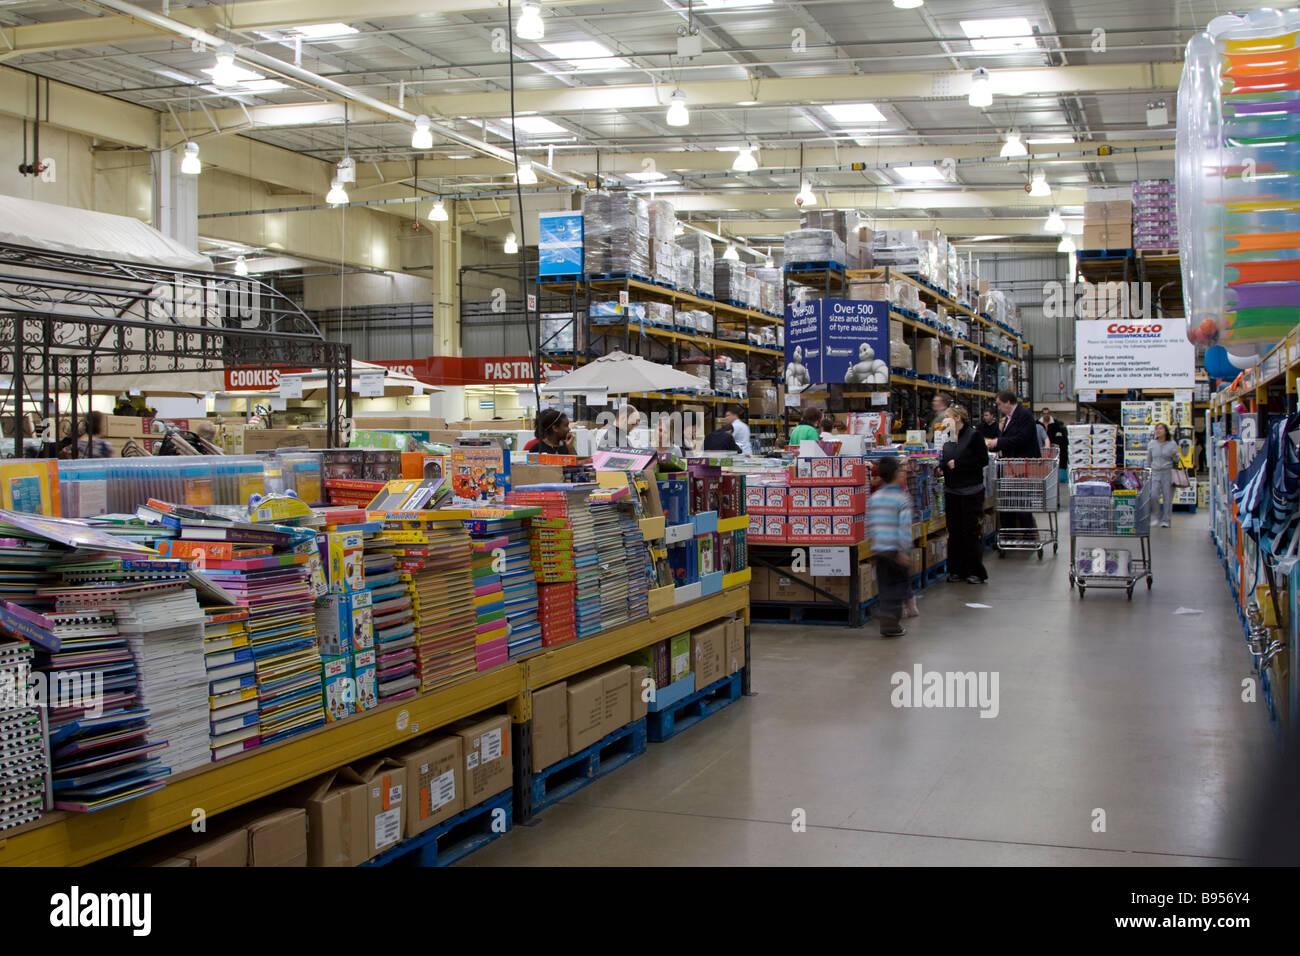 Costco Warehouse Stockfotos & Costco Warehouse Bilder - Alamy